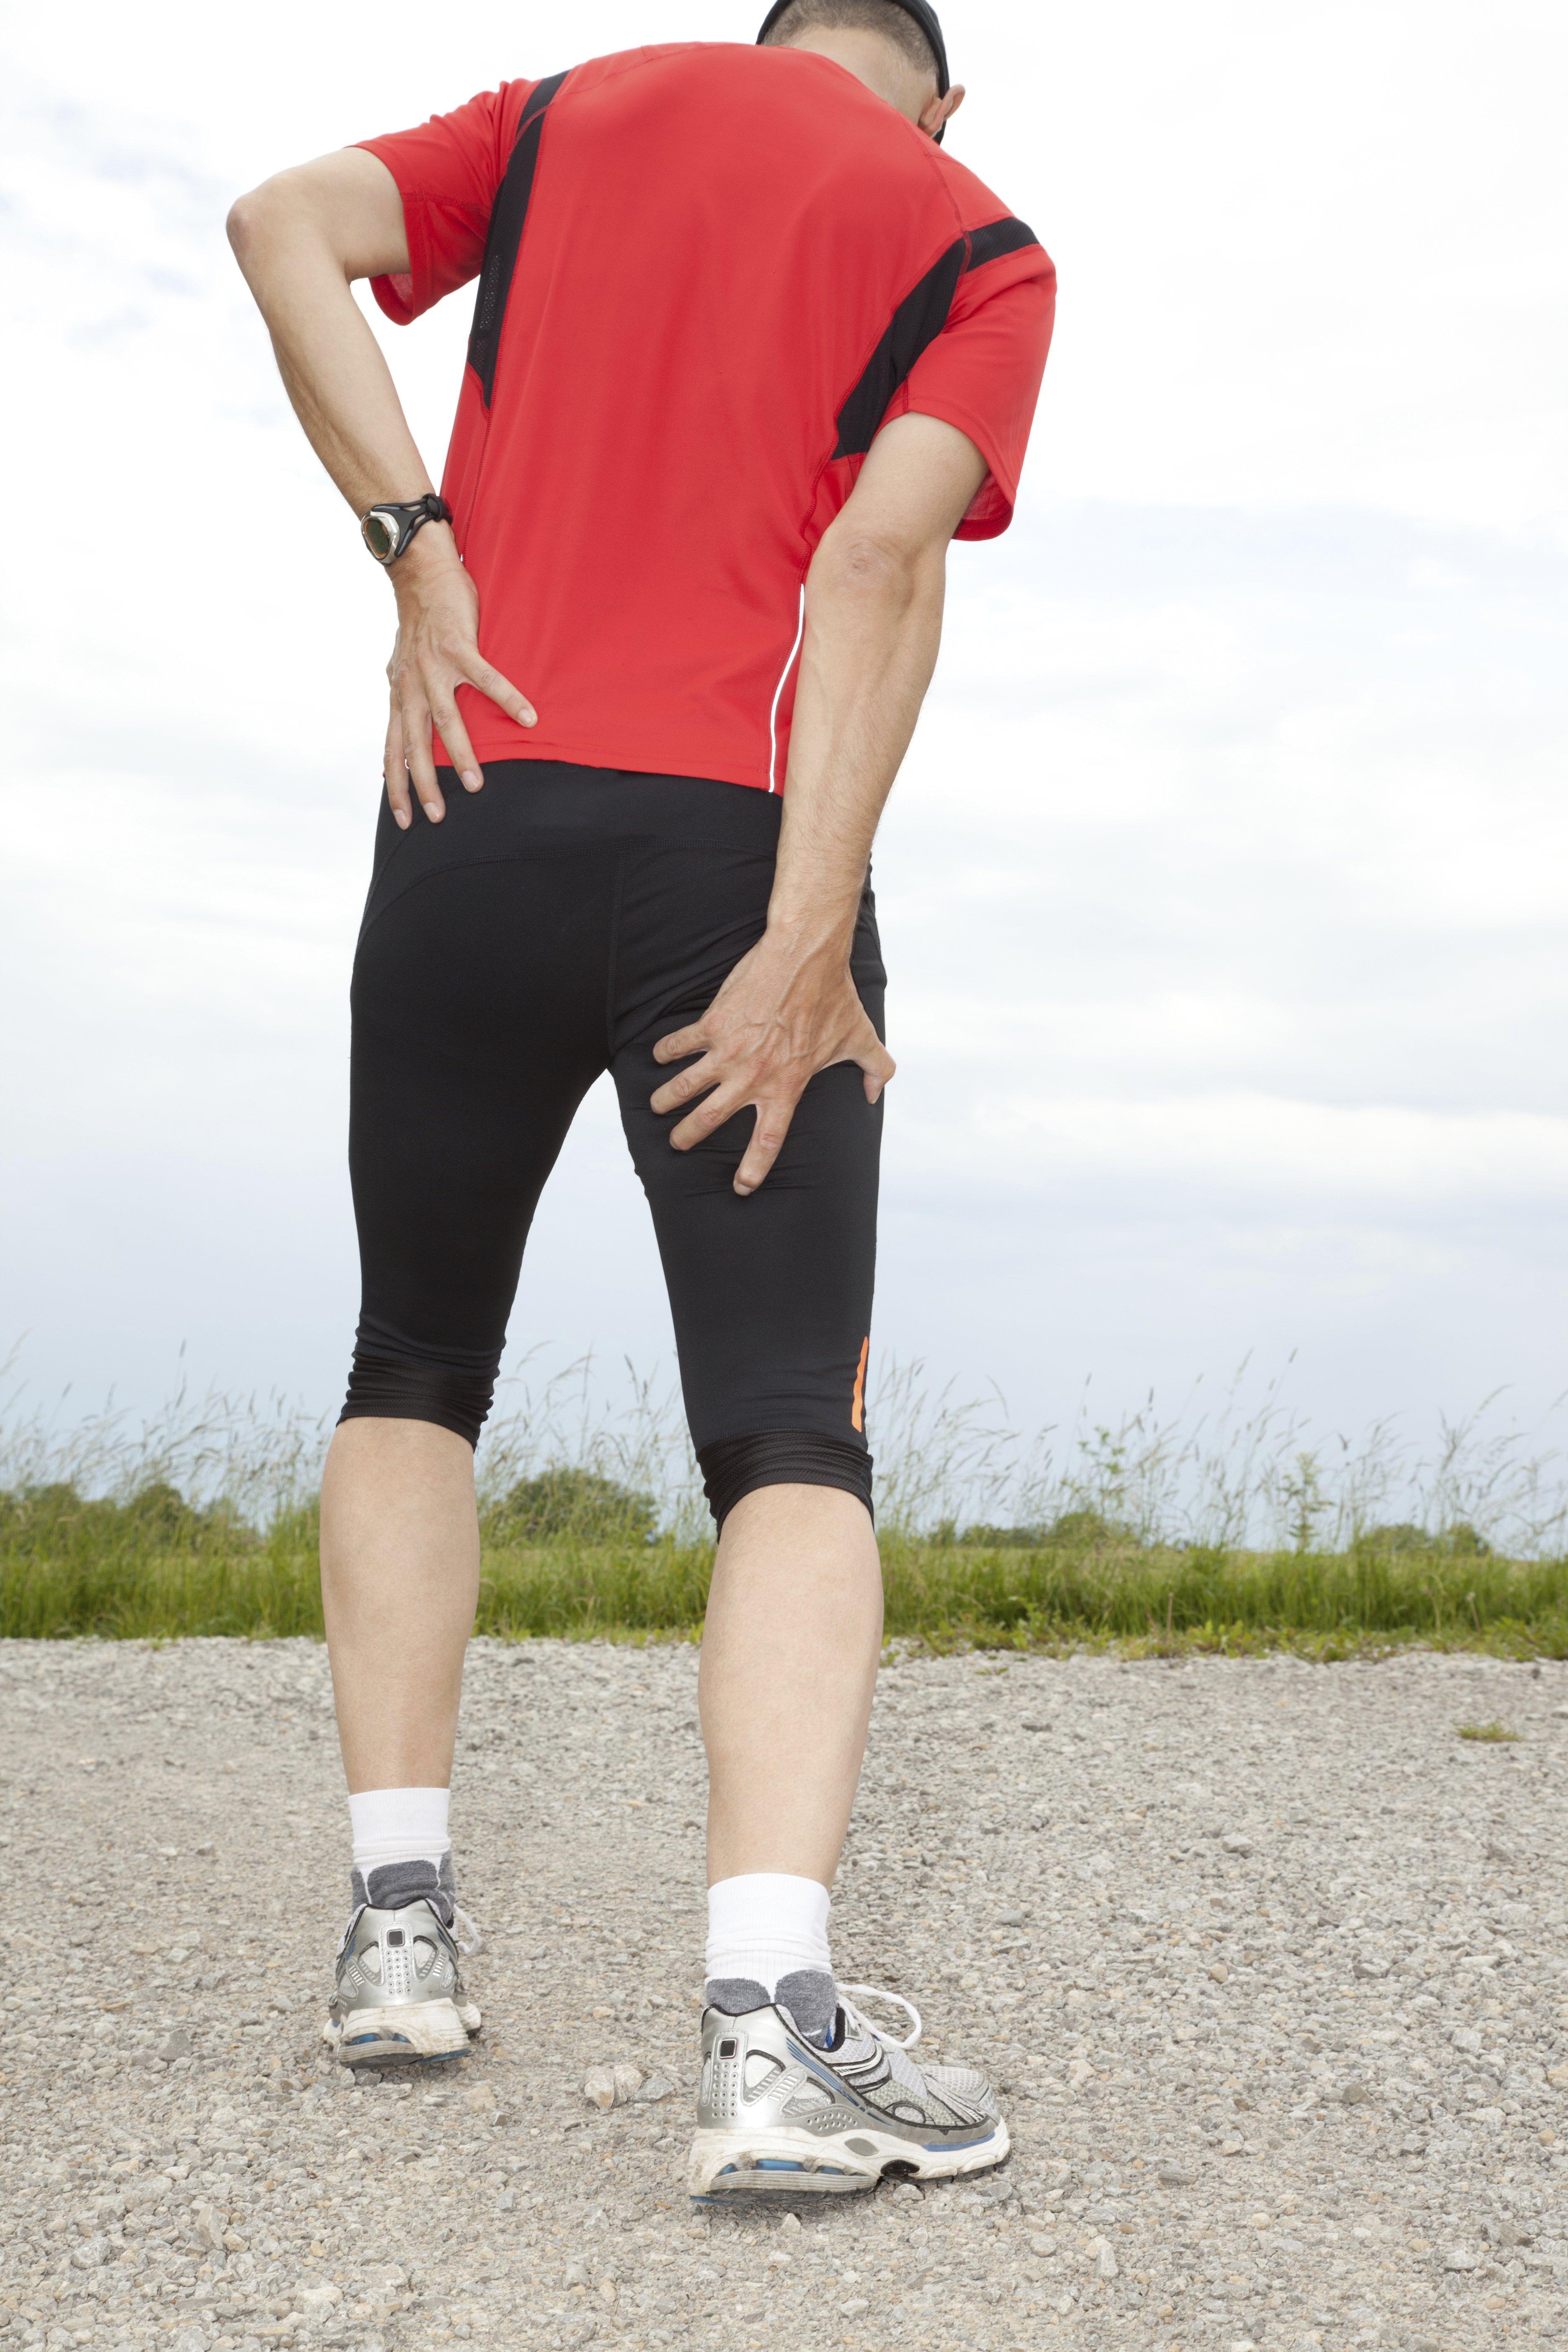 sciatica pain sports athlete pain relief massage